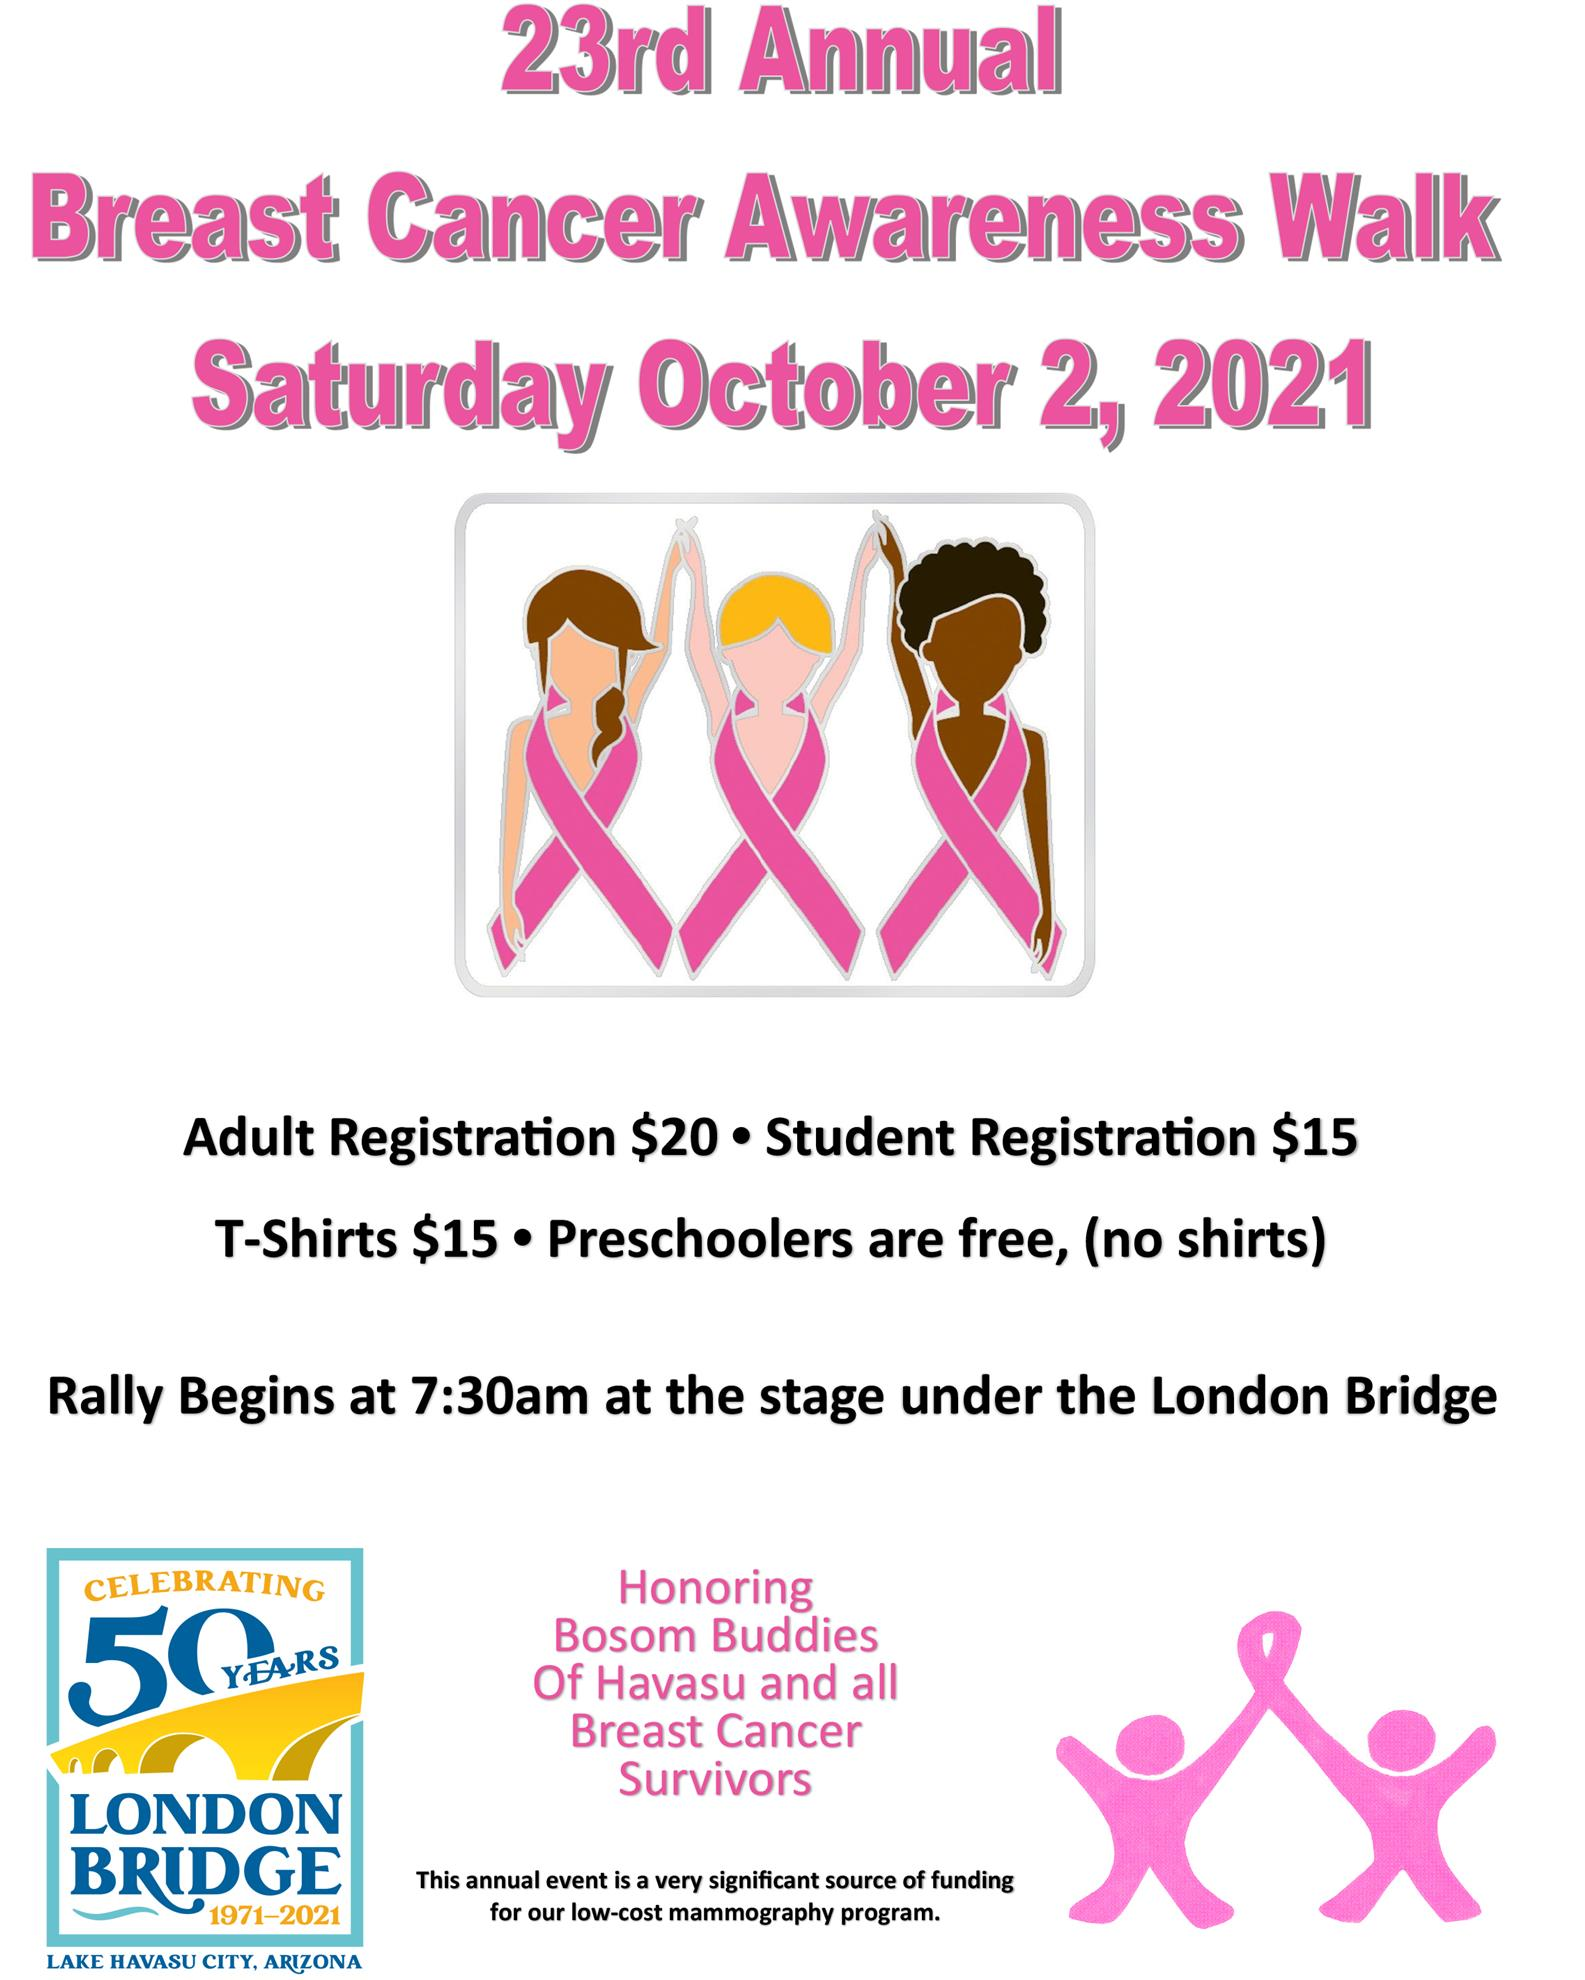 2019 Breast Cancer Awareness Walk